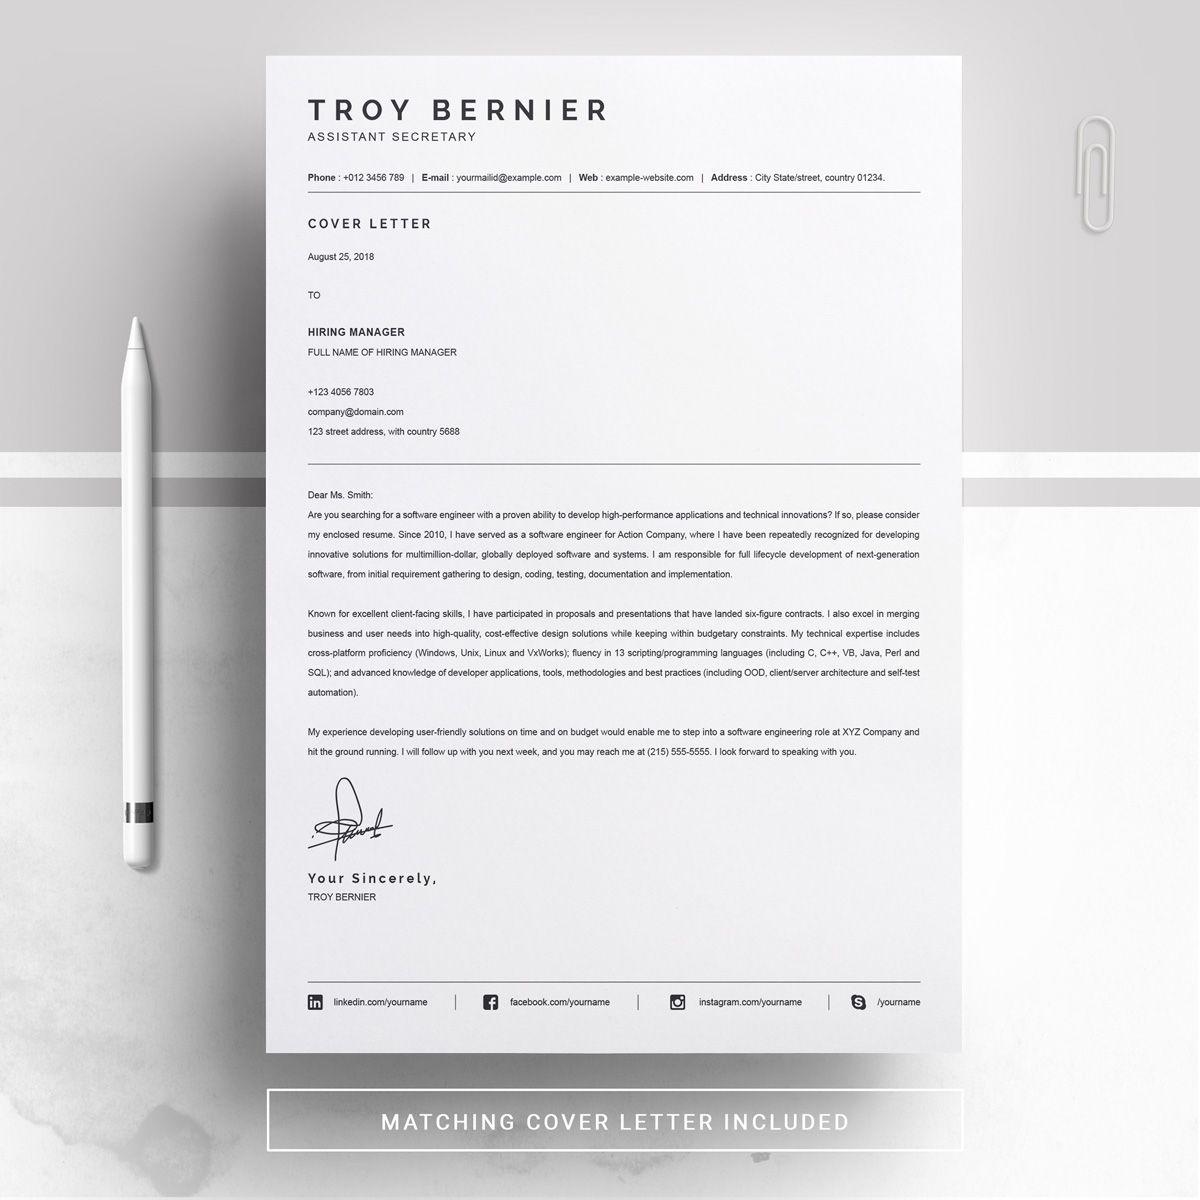 Troy Bernier Resume Template Ad Resume Bernier Troy